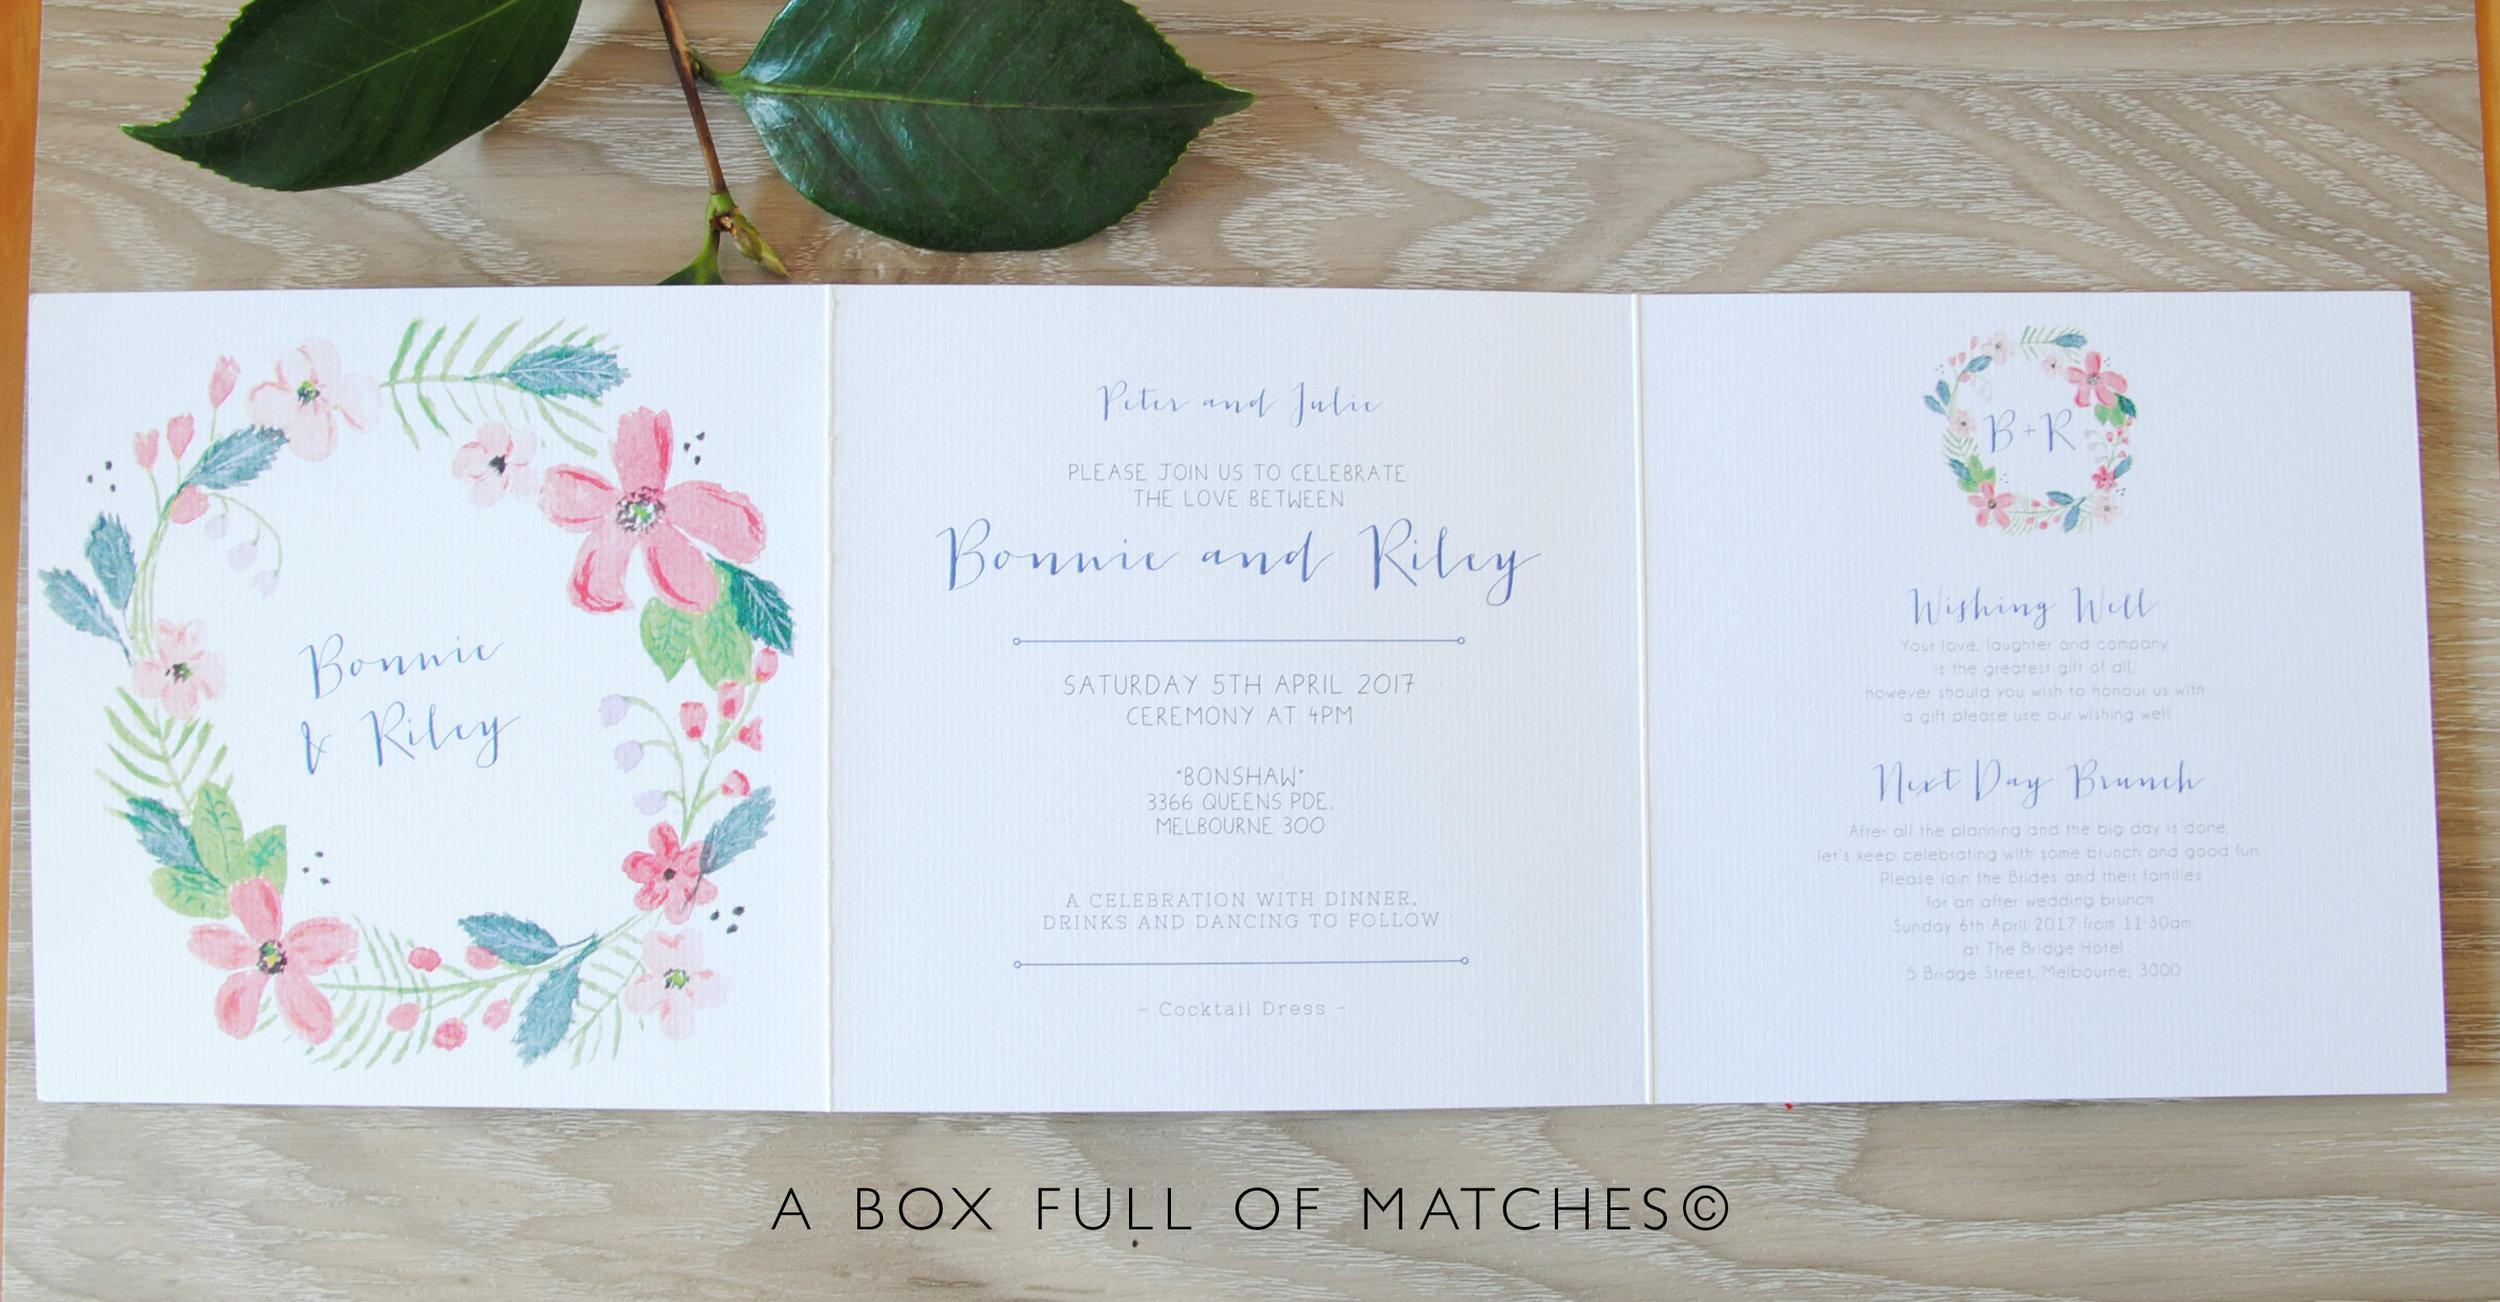 WEDDING-INVITATION-WREATH-01.jpg